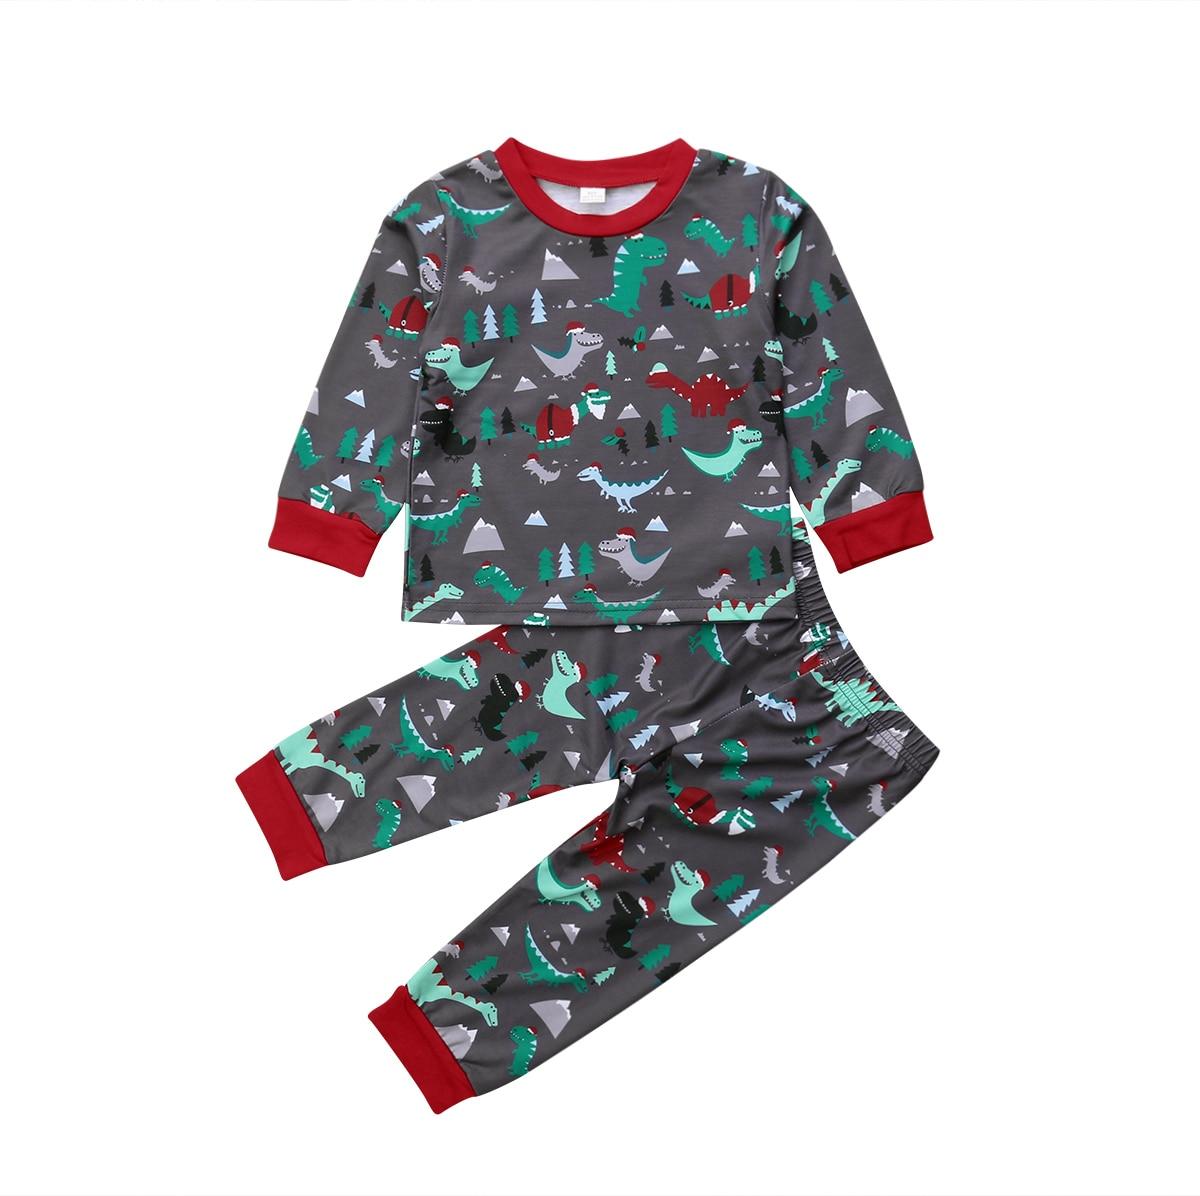 Kids Baby Girl Boy Christmas Dinosaur Tops T shirt Pants Leggings Outfit Clothes   Pajamas     Set